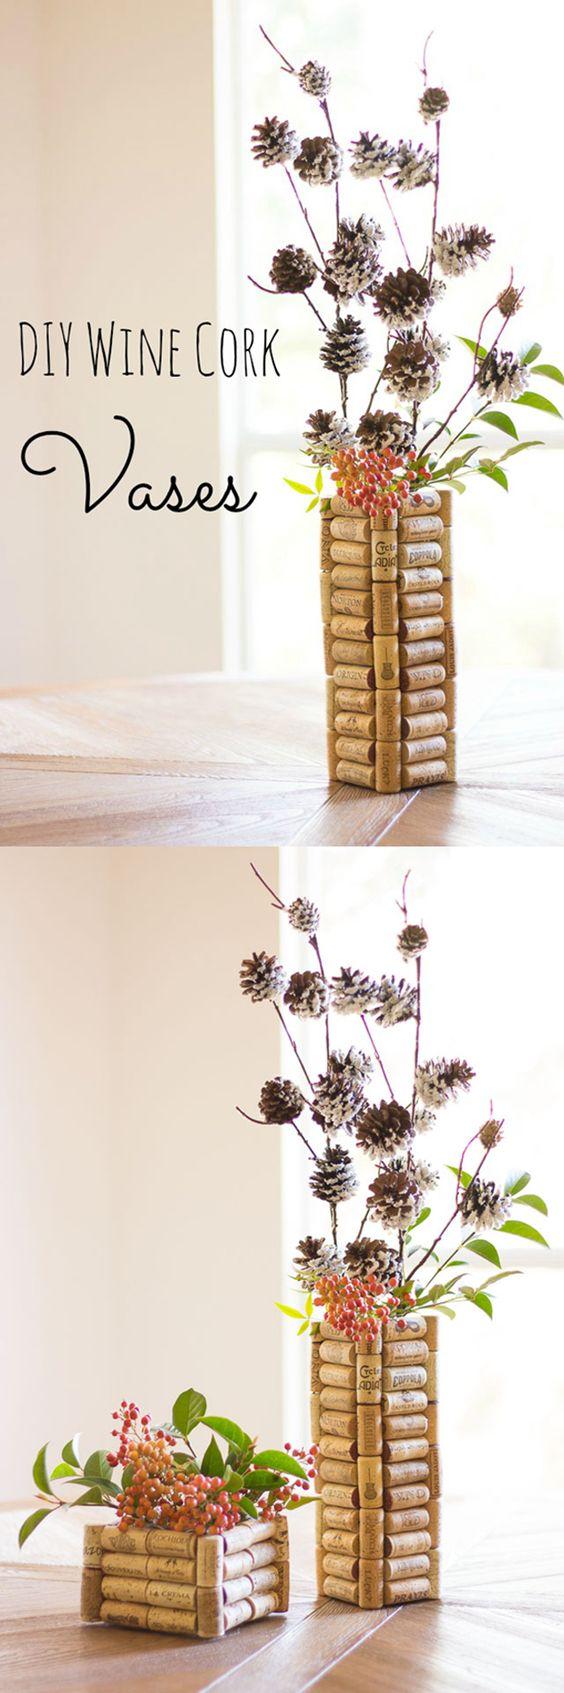 43 more diy wine cork crafts ideas tiger feng for Wine cork crafts guide